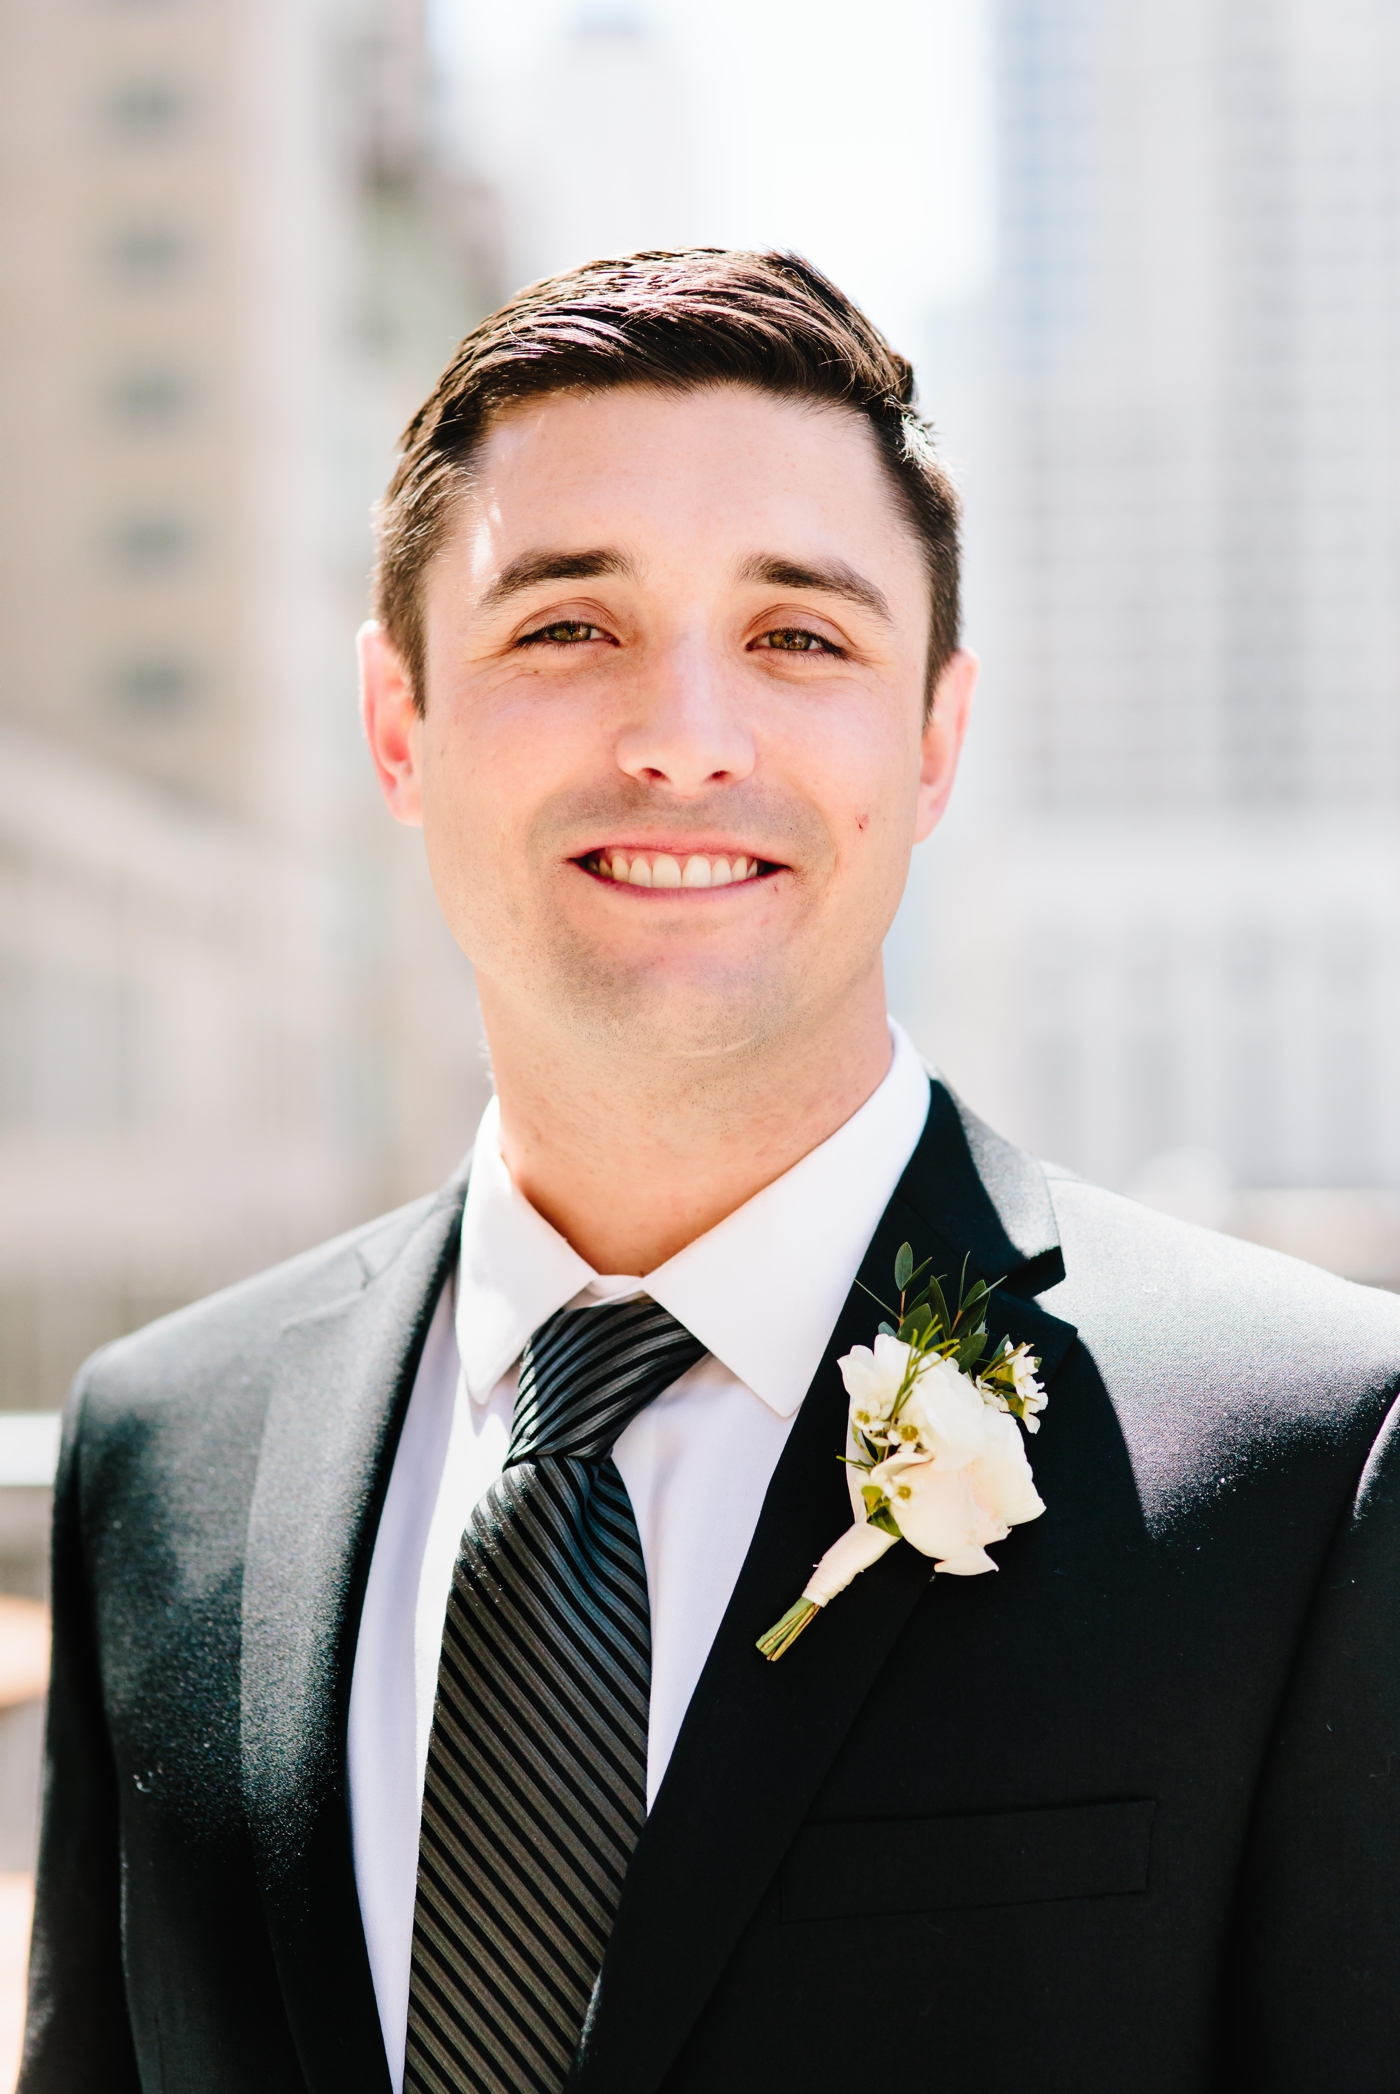 chicago-fine-art-wedding-photography-blais8